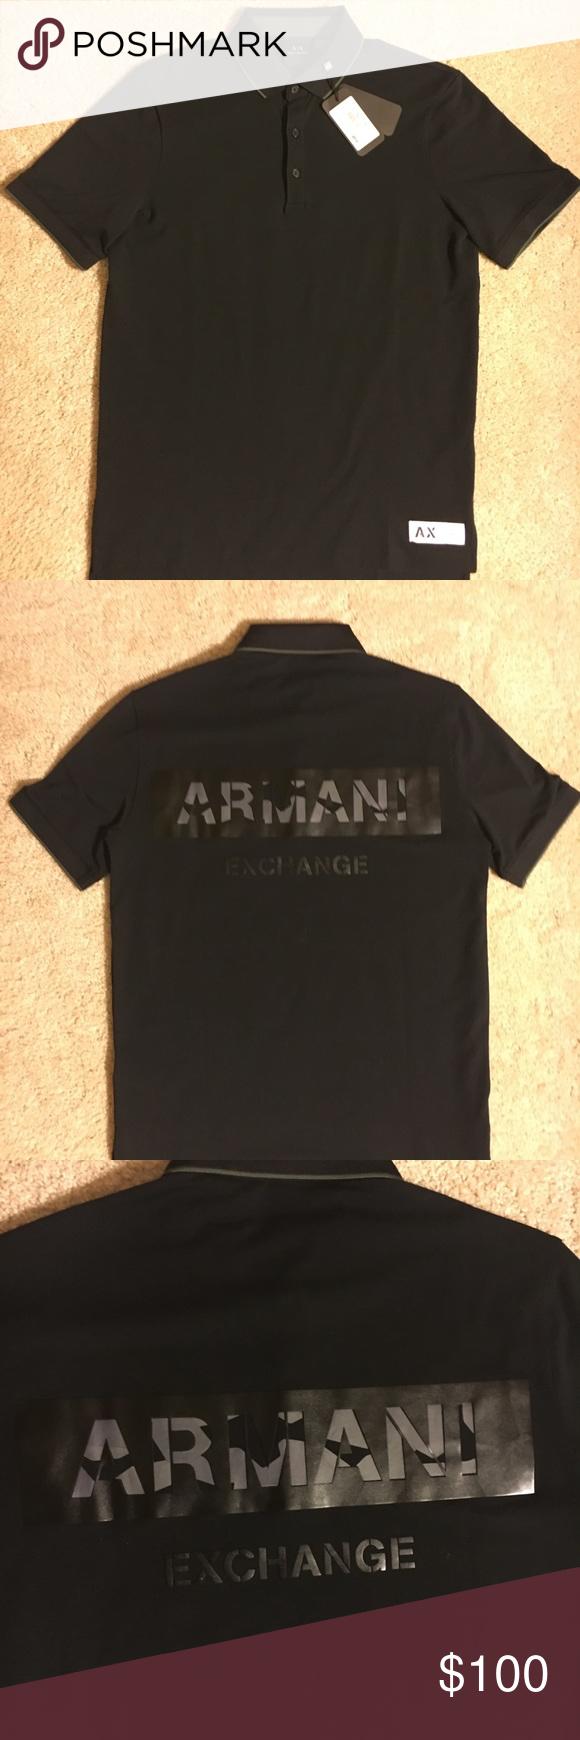 Polo Exchange Shirt T Closet In 2018 Nwt My Posh Armani ZxHwqdt5Z